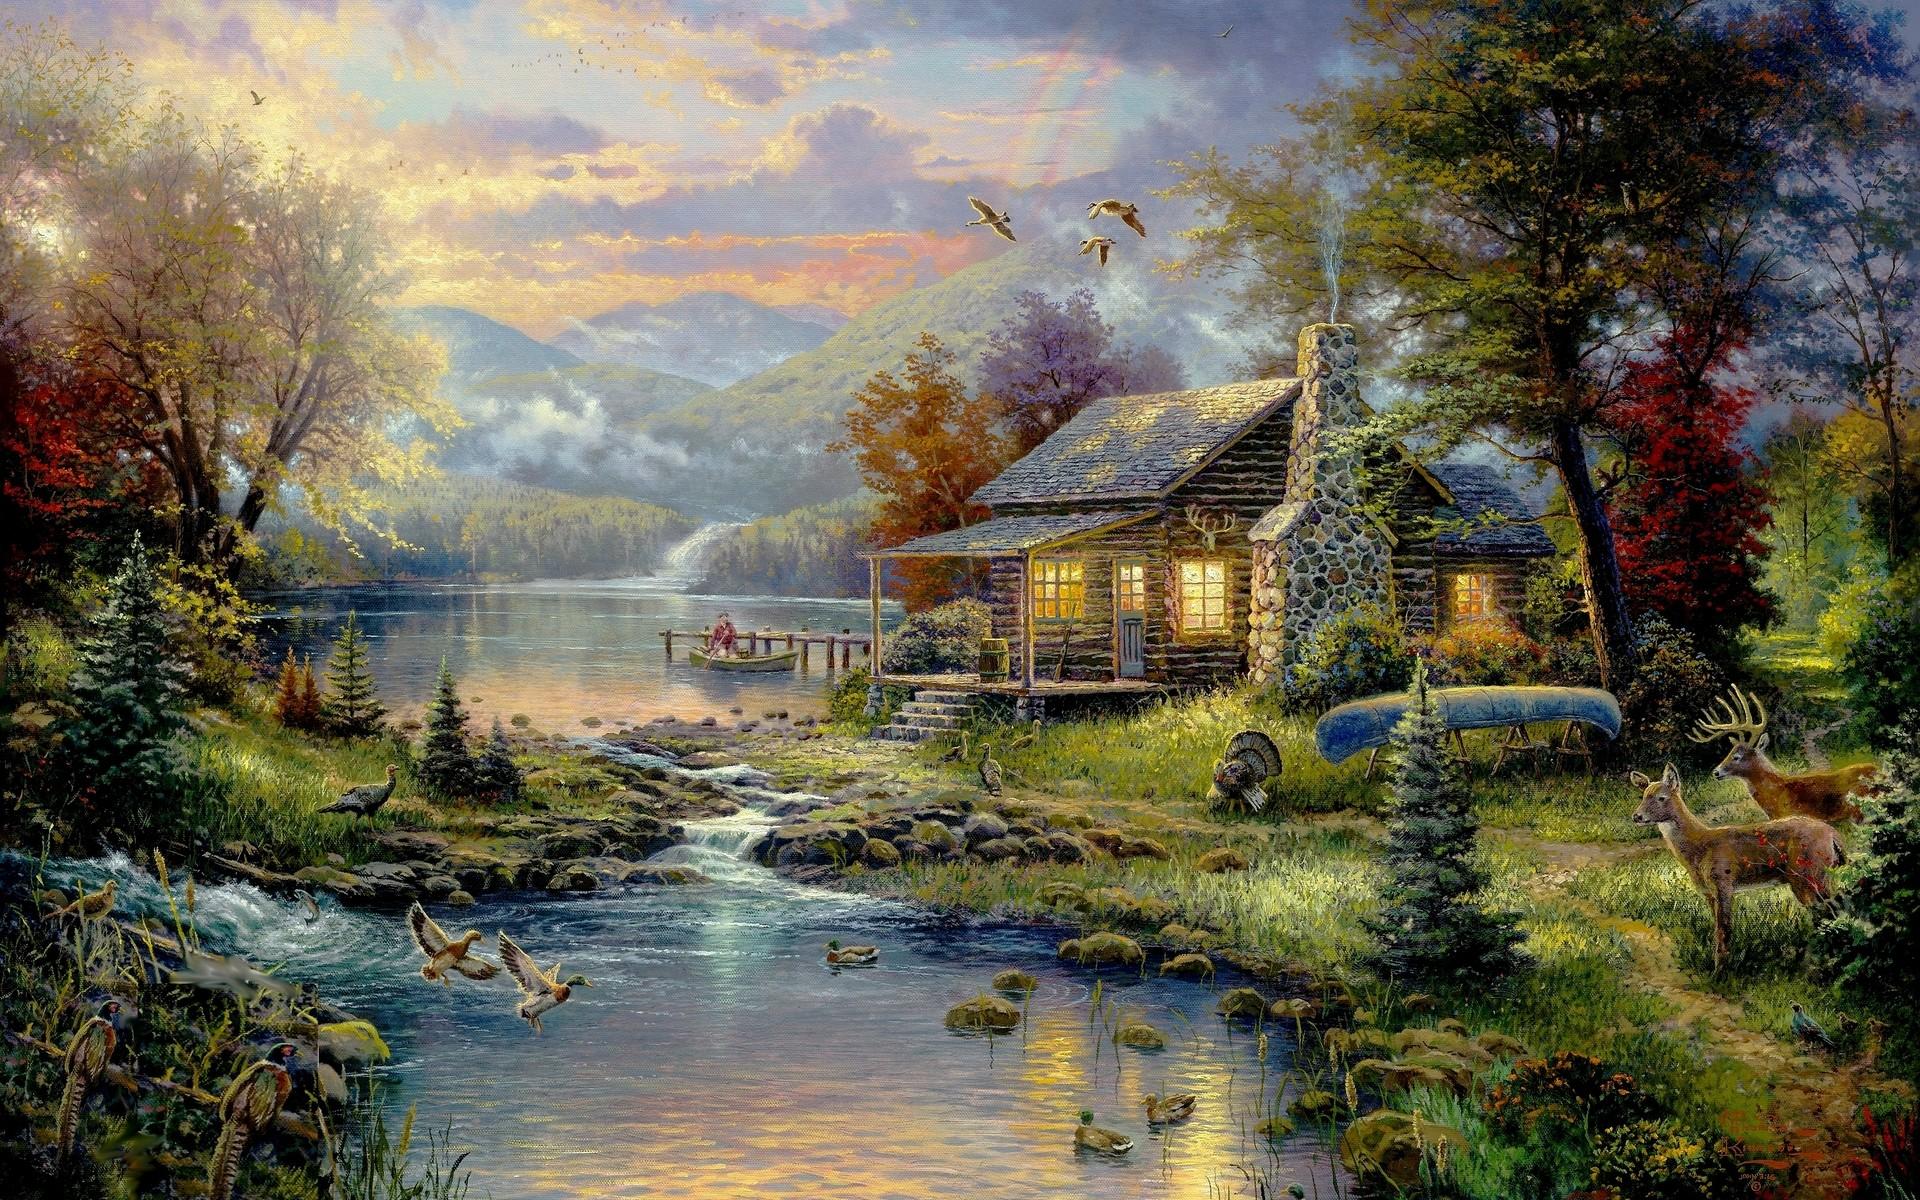 Wallpaper Hd Art Paintings